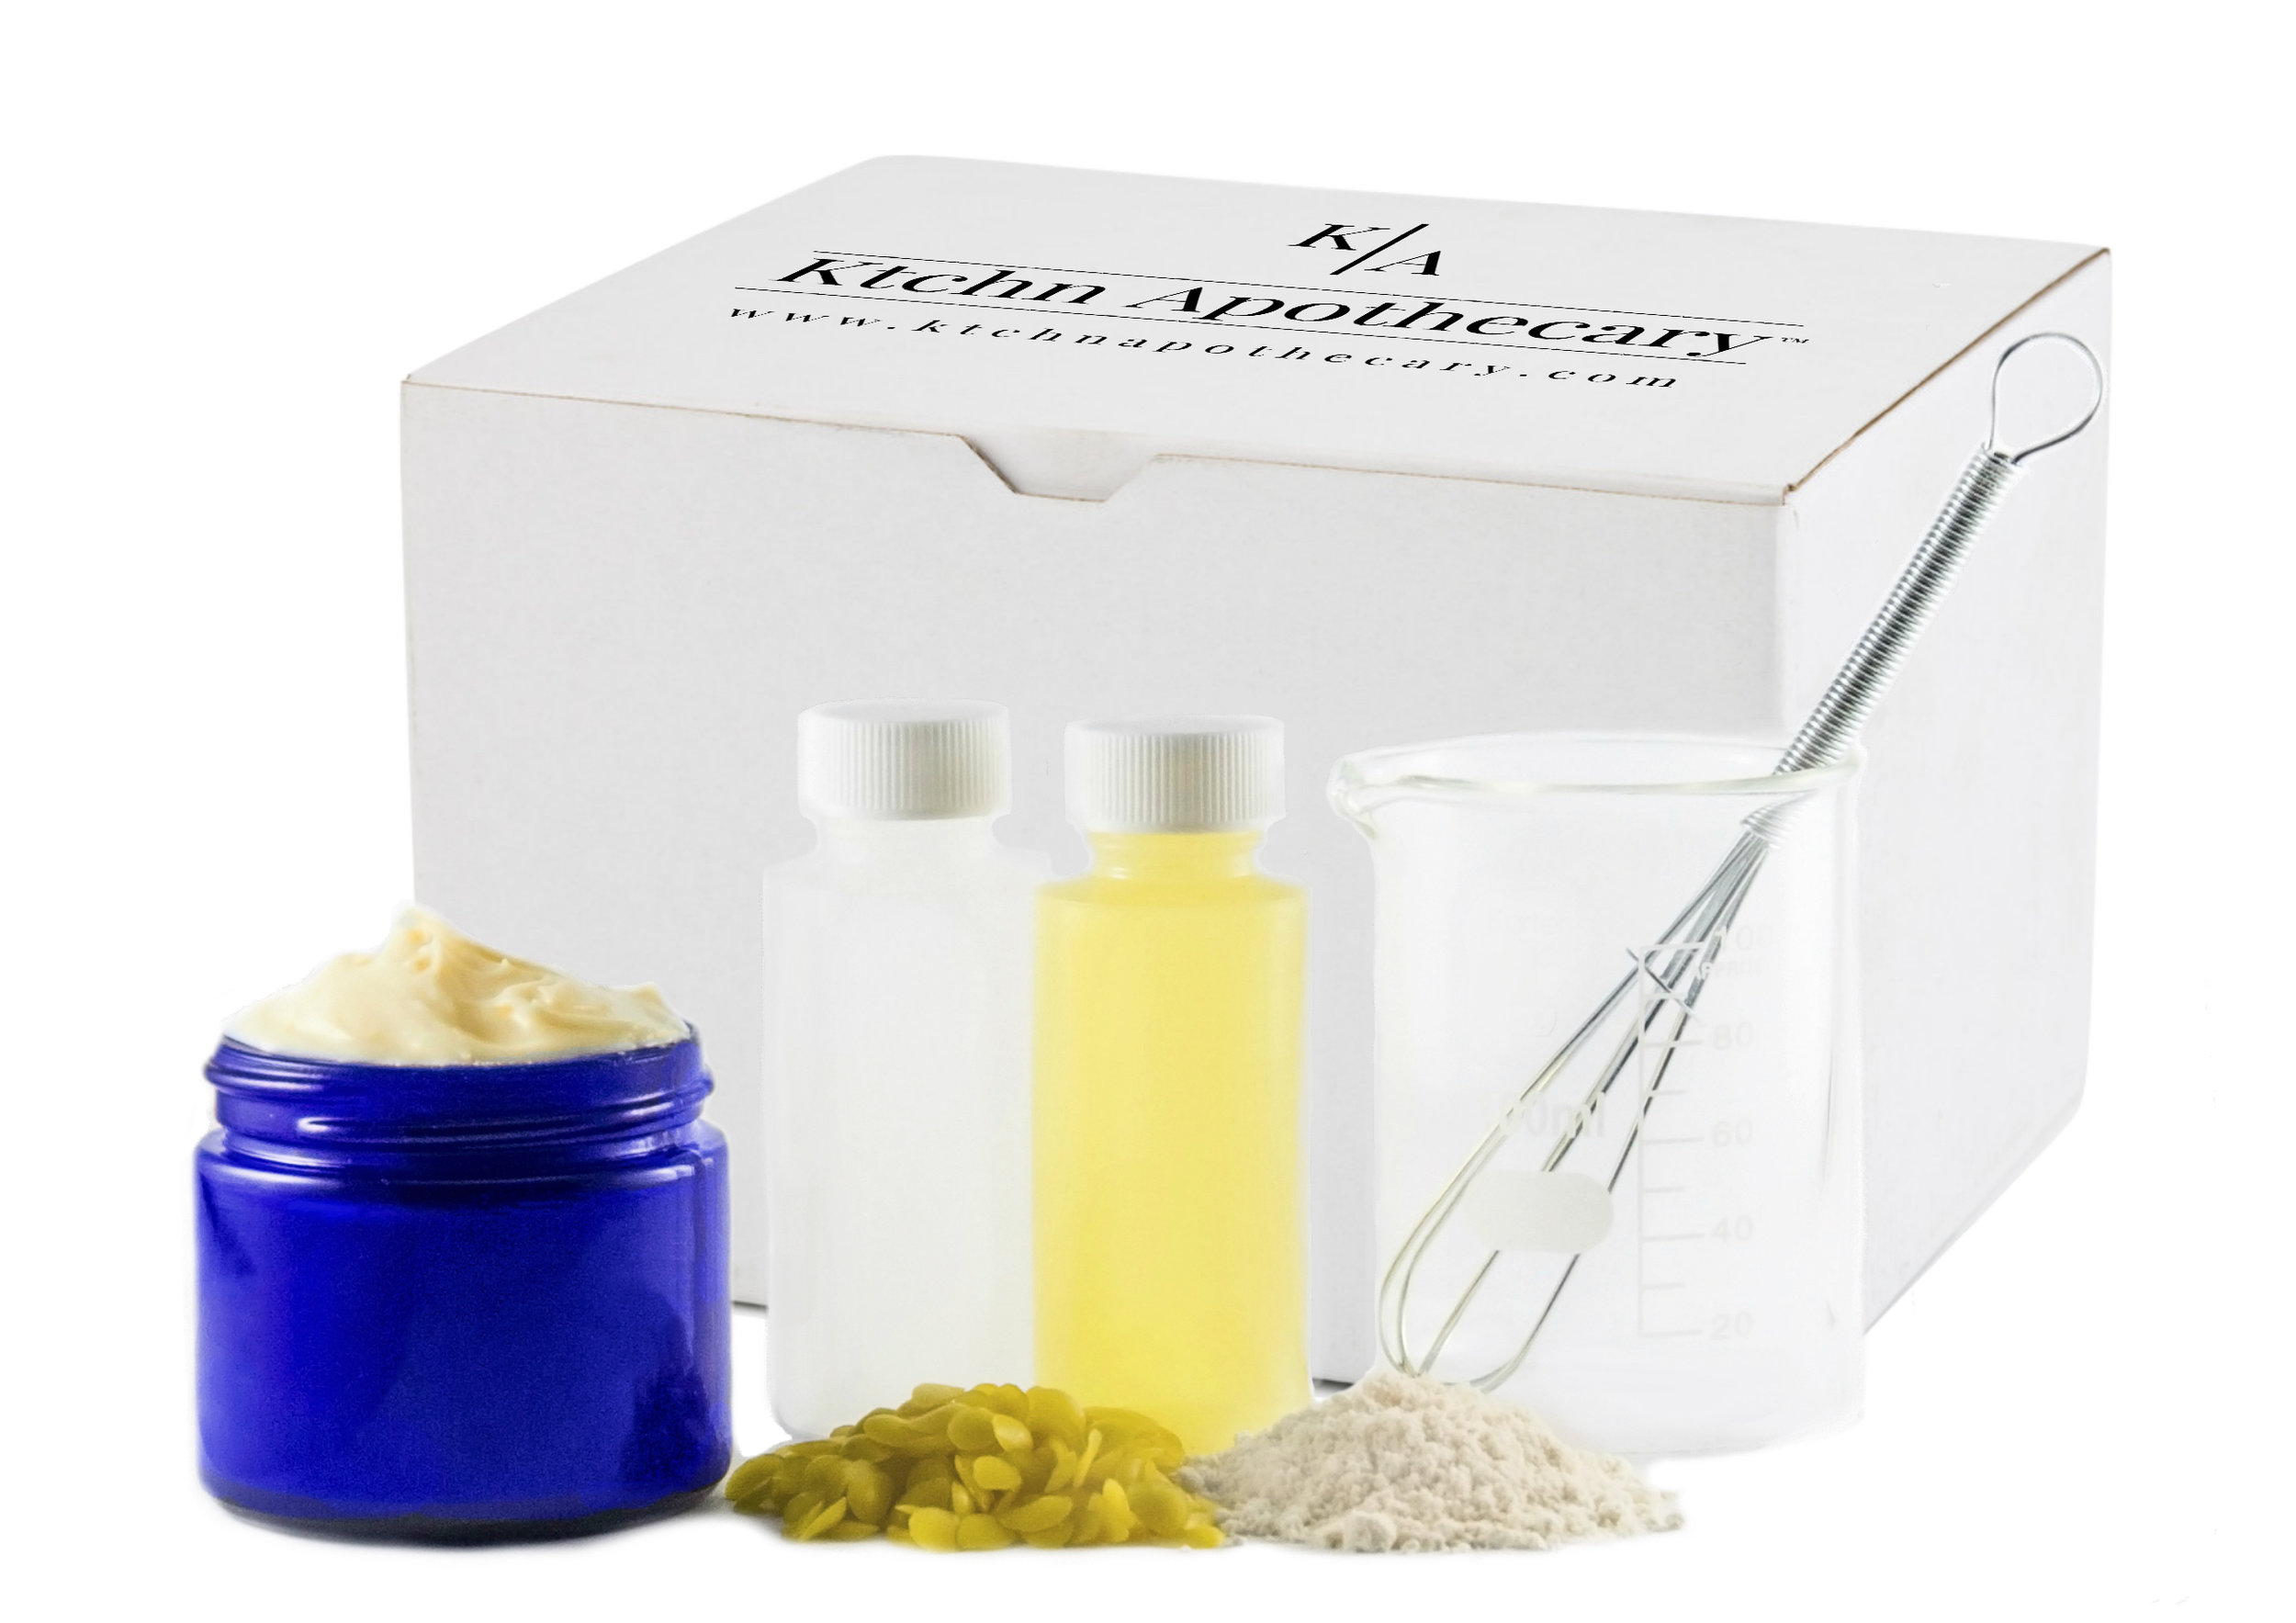 Ktchn Apothecary Revitalizing Facial Cream Kit